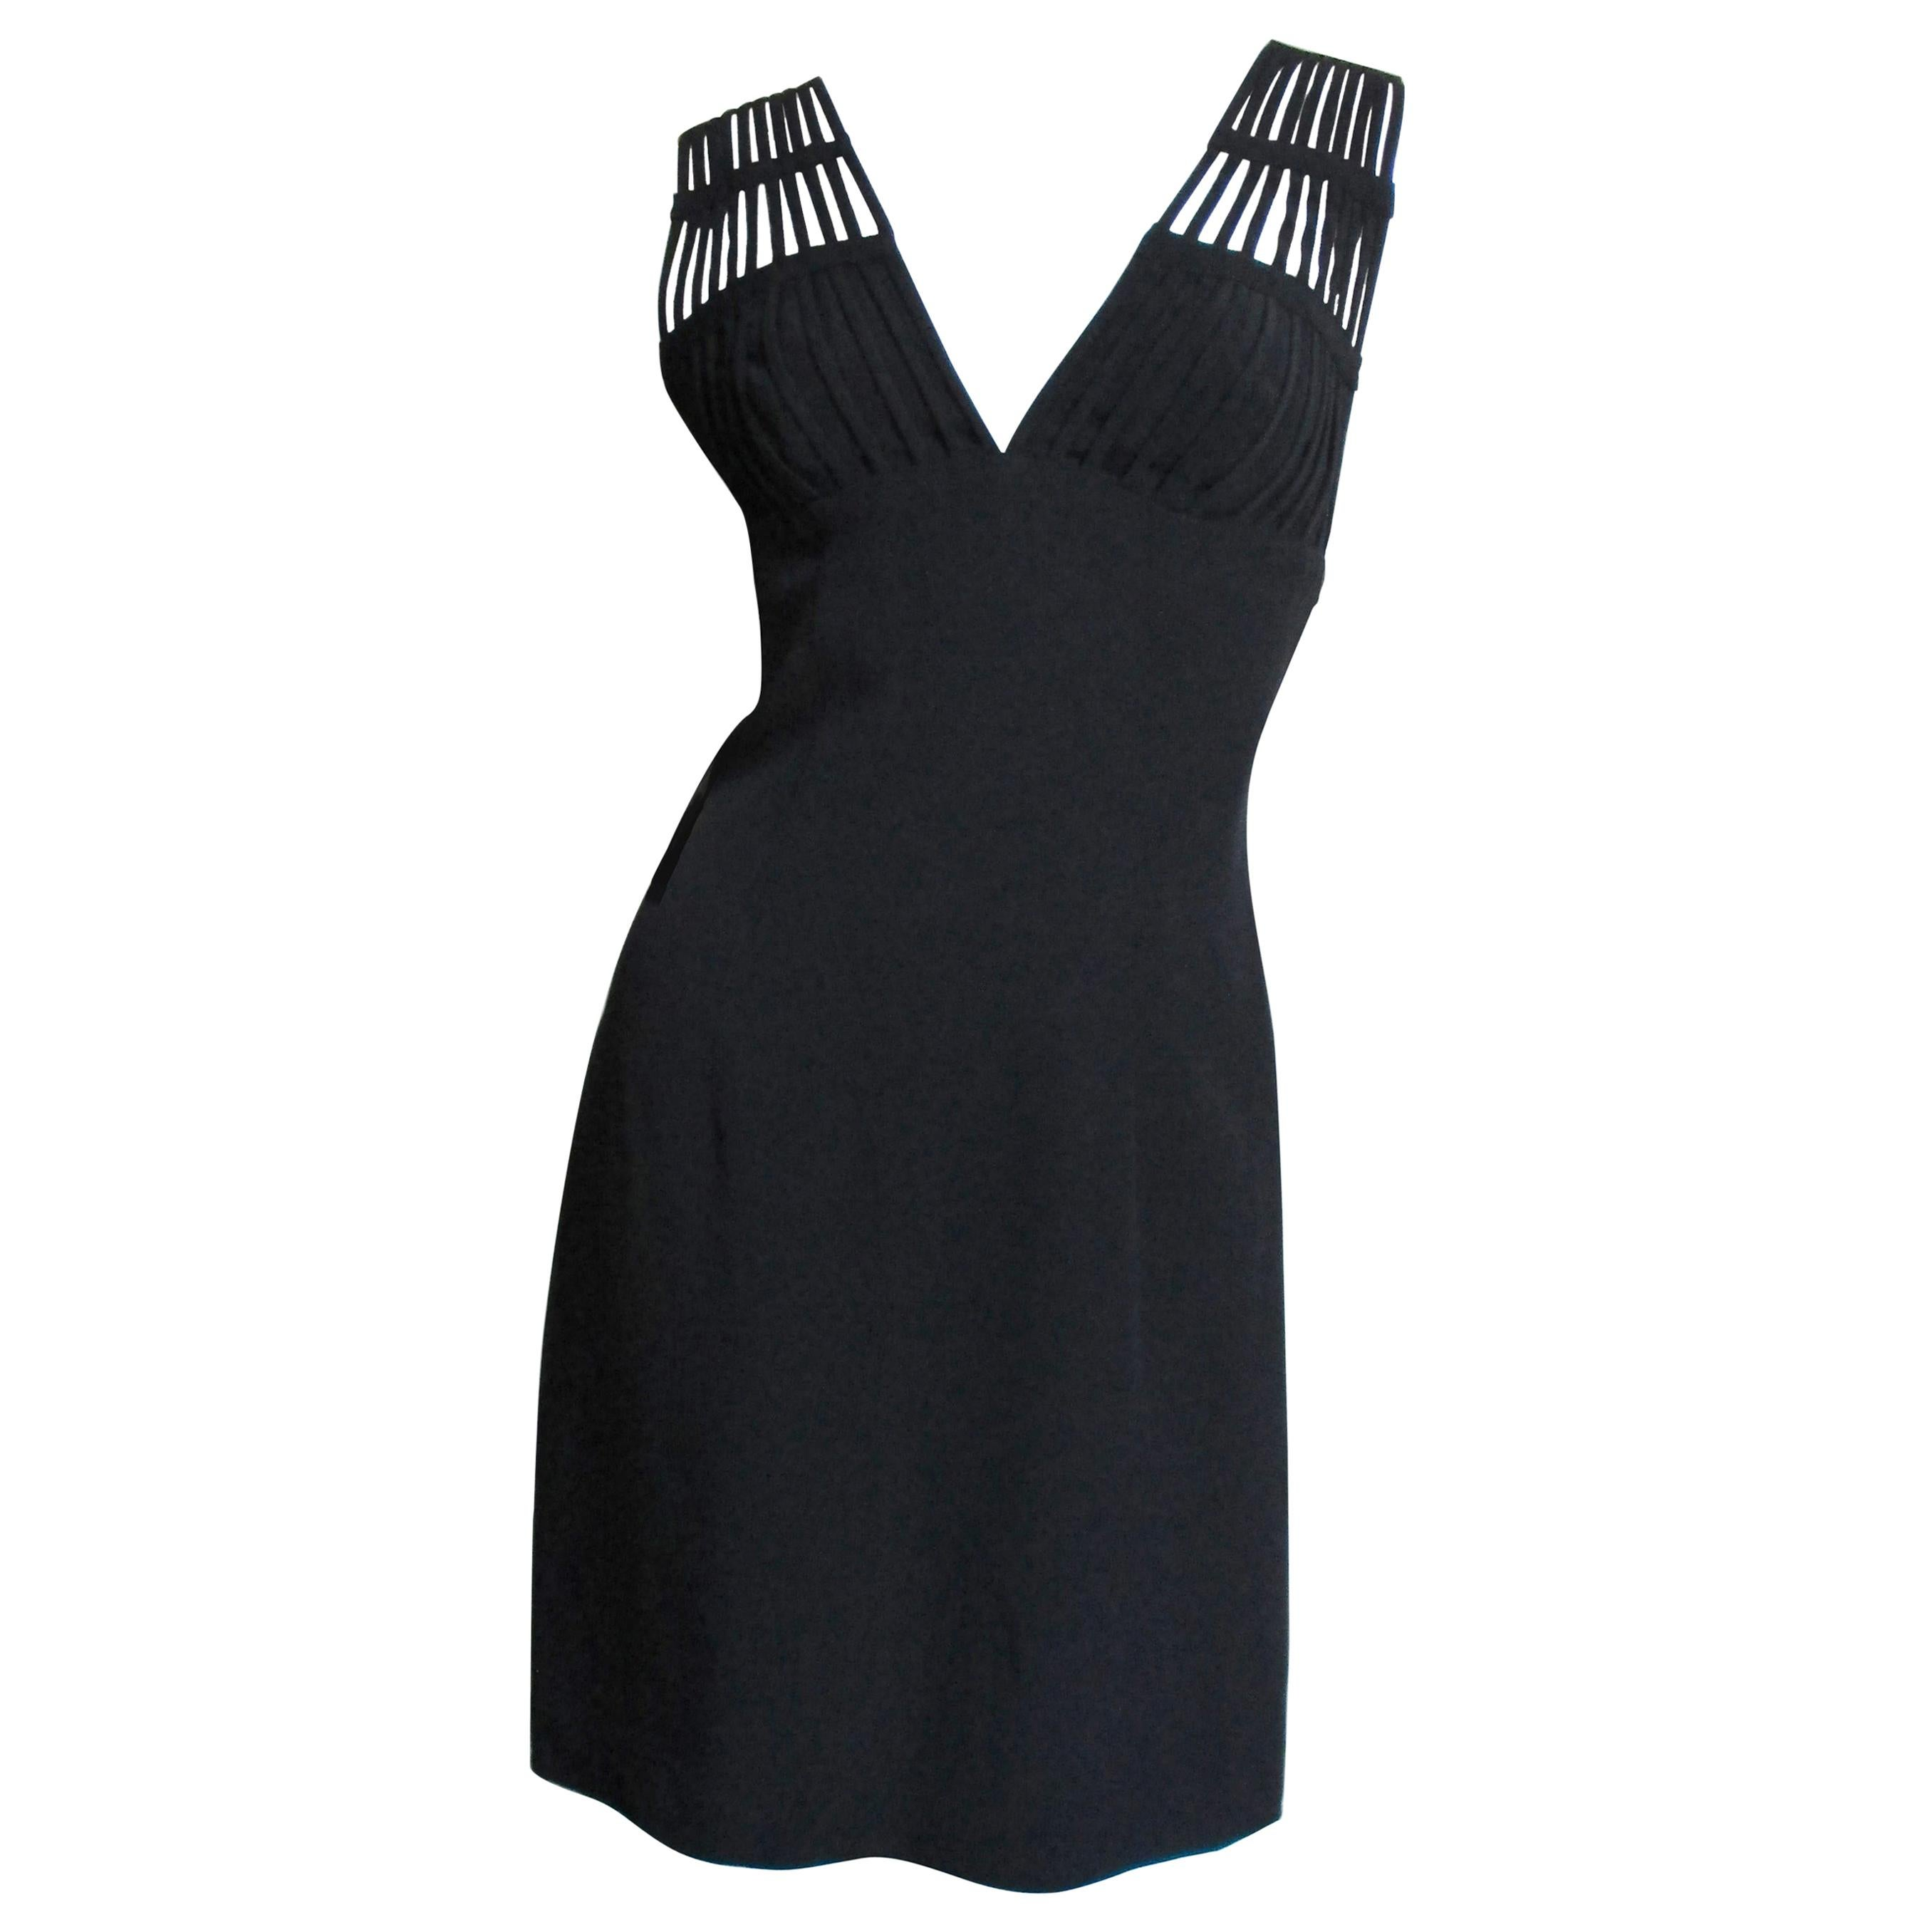 Sophie Sitbon Cage Shoulders Dress